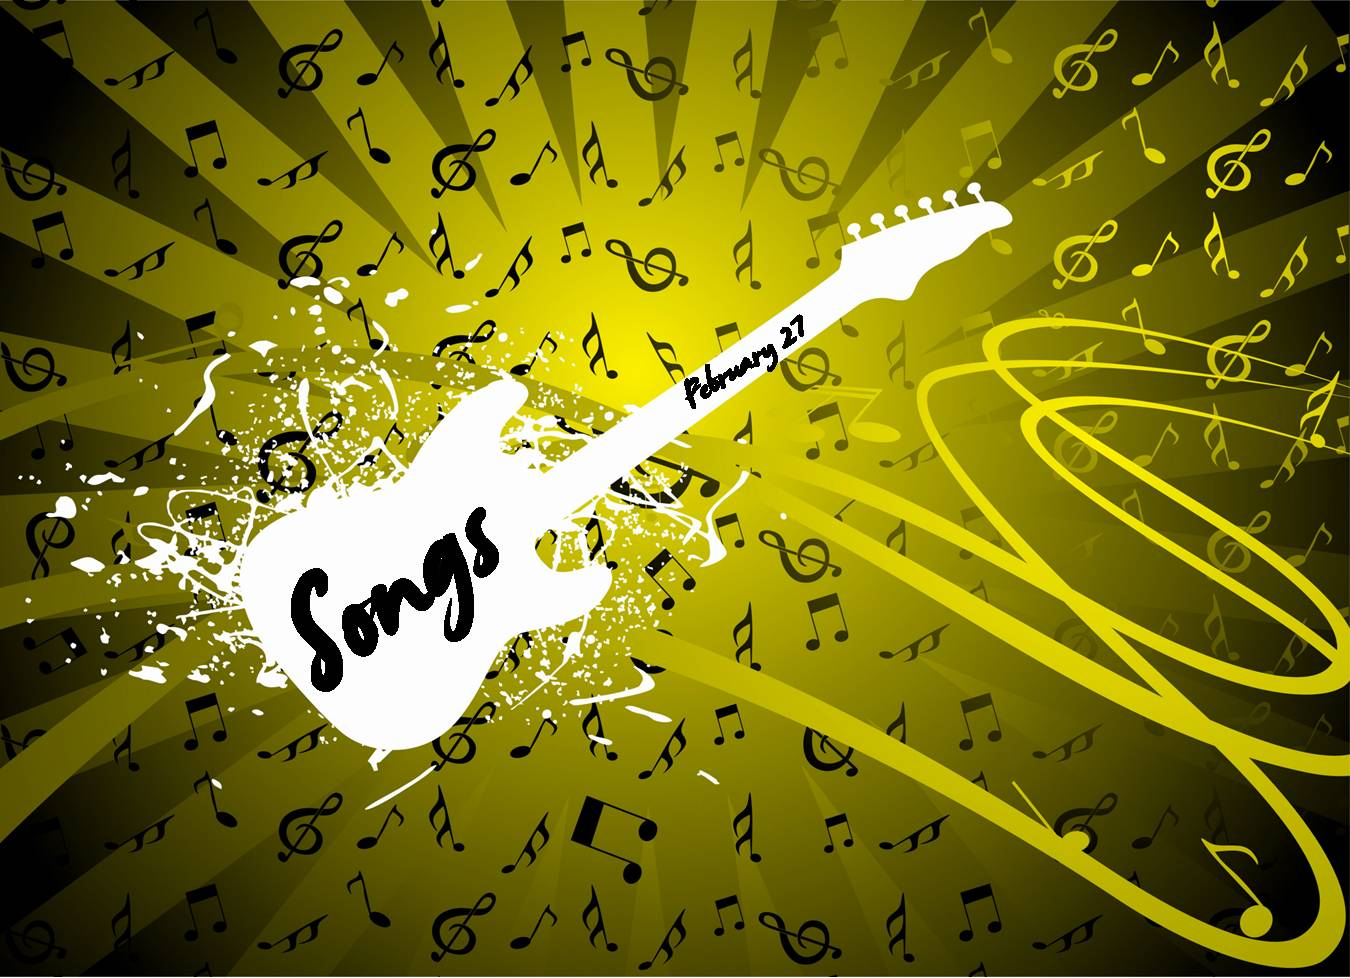 http://4.bp.blogspot.com/_eP7Em1Sp4Bc/TQnI1jQO2XI/AAAAAAAAAqY/dN3XiKahpQ0/s1600/songs.jpg